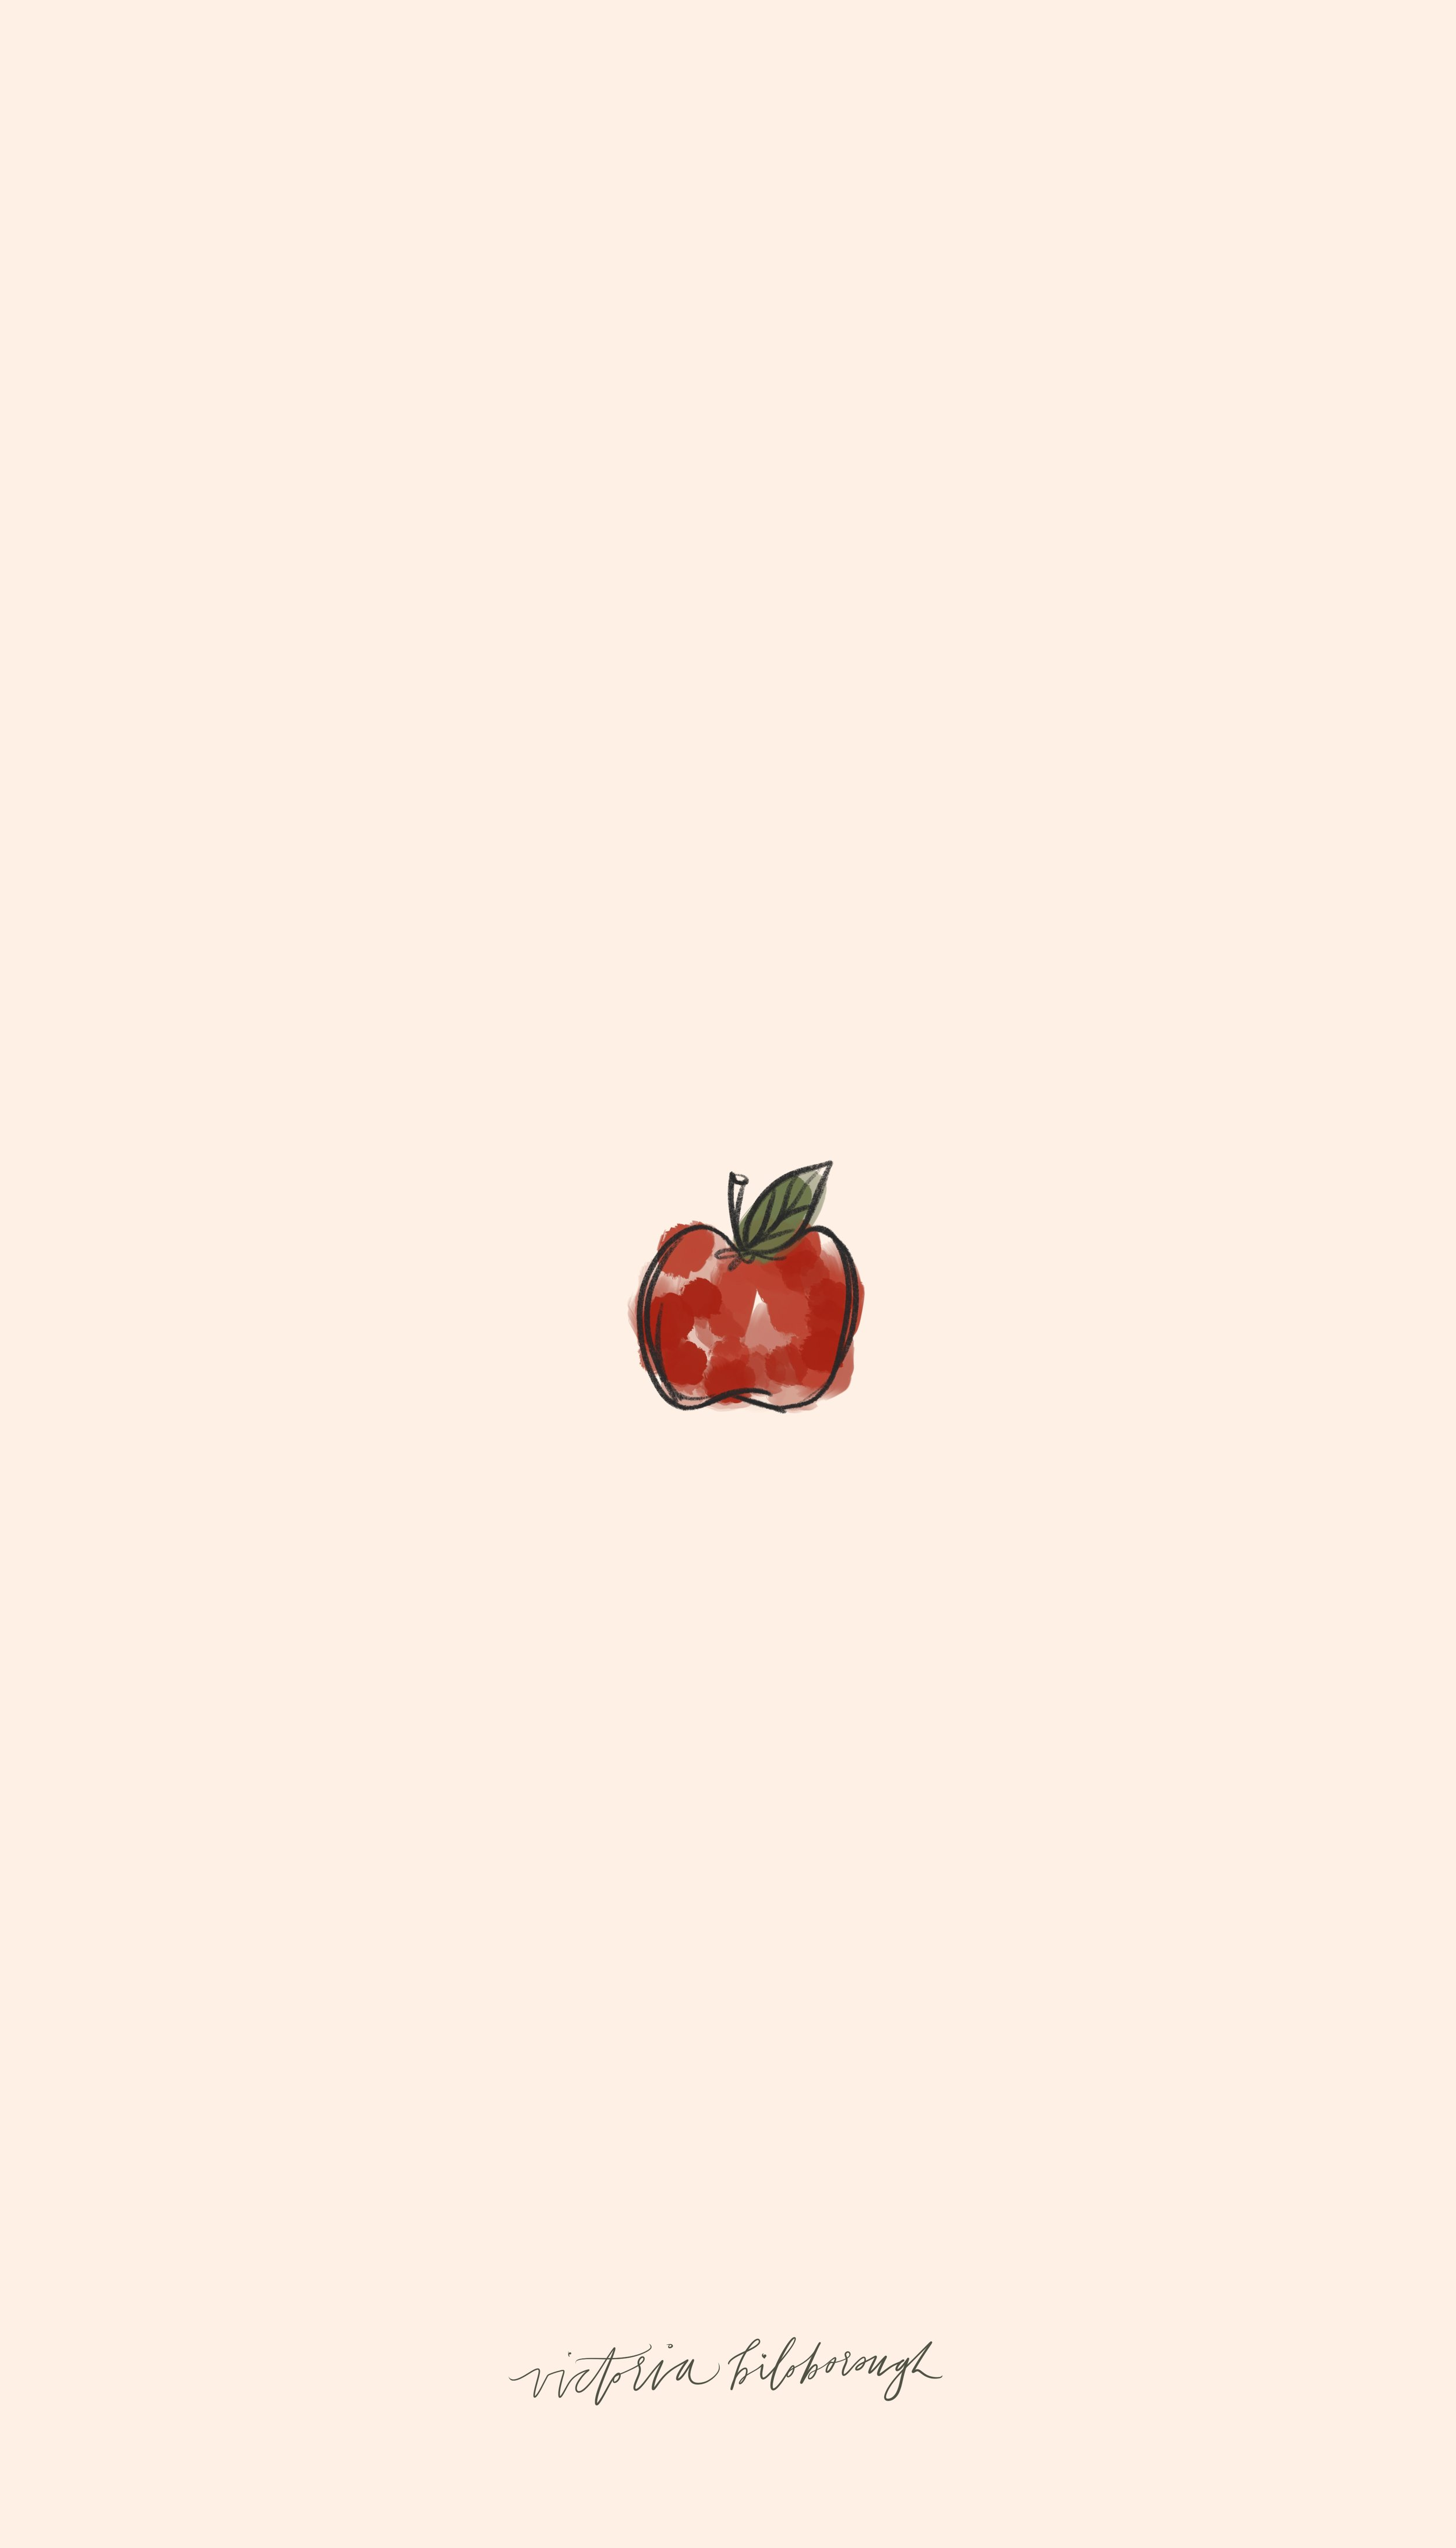 VictoriaBilsborough-Apple.JPG